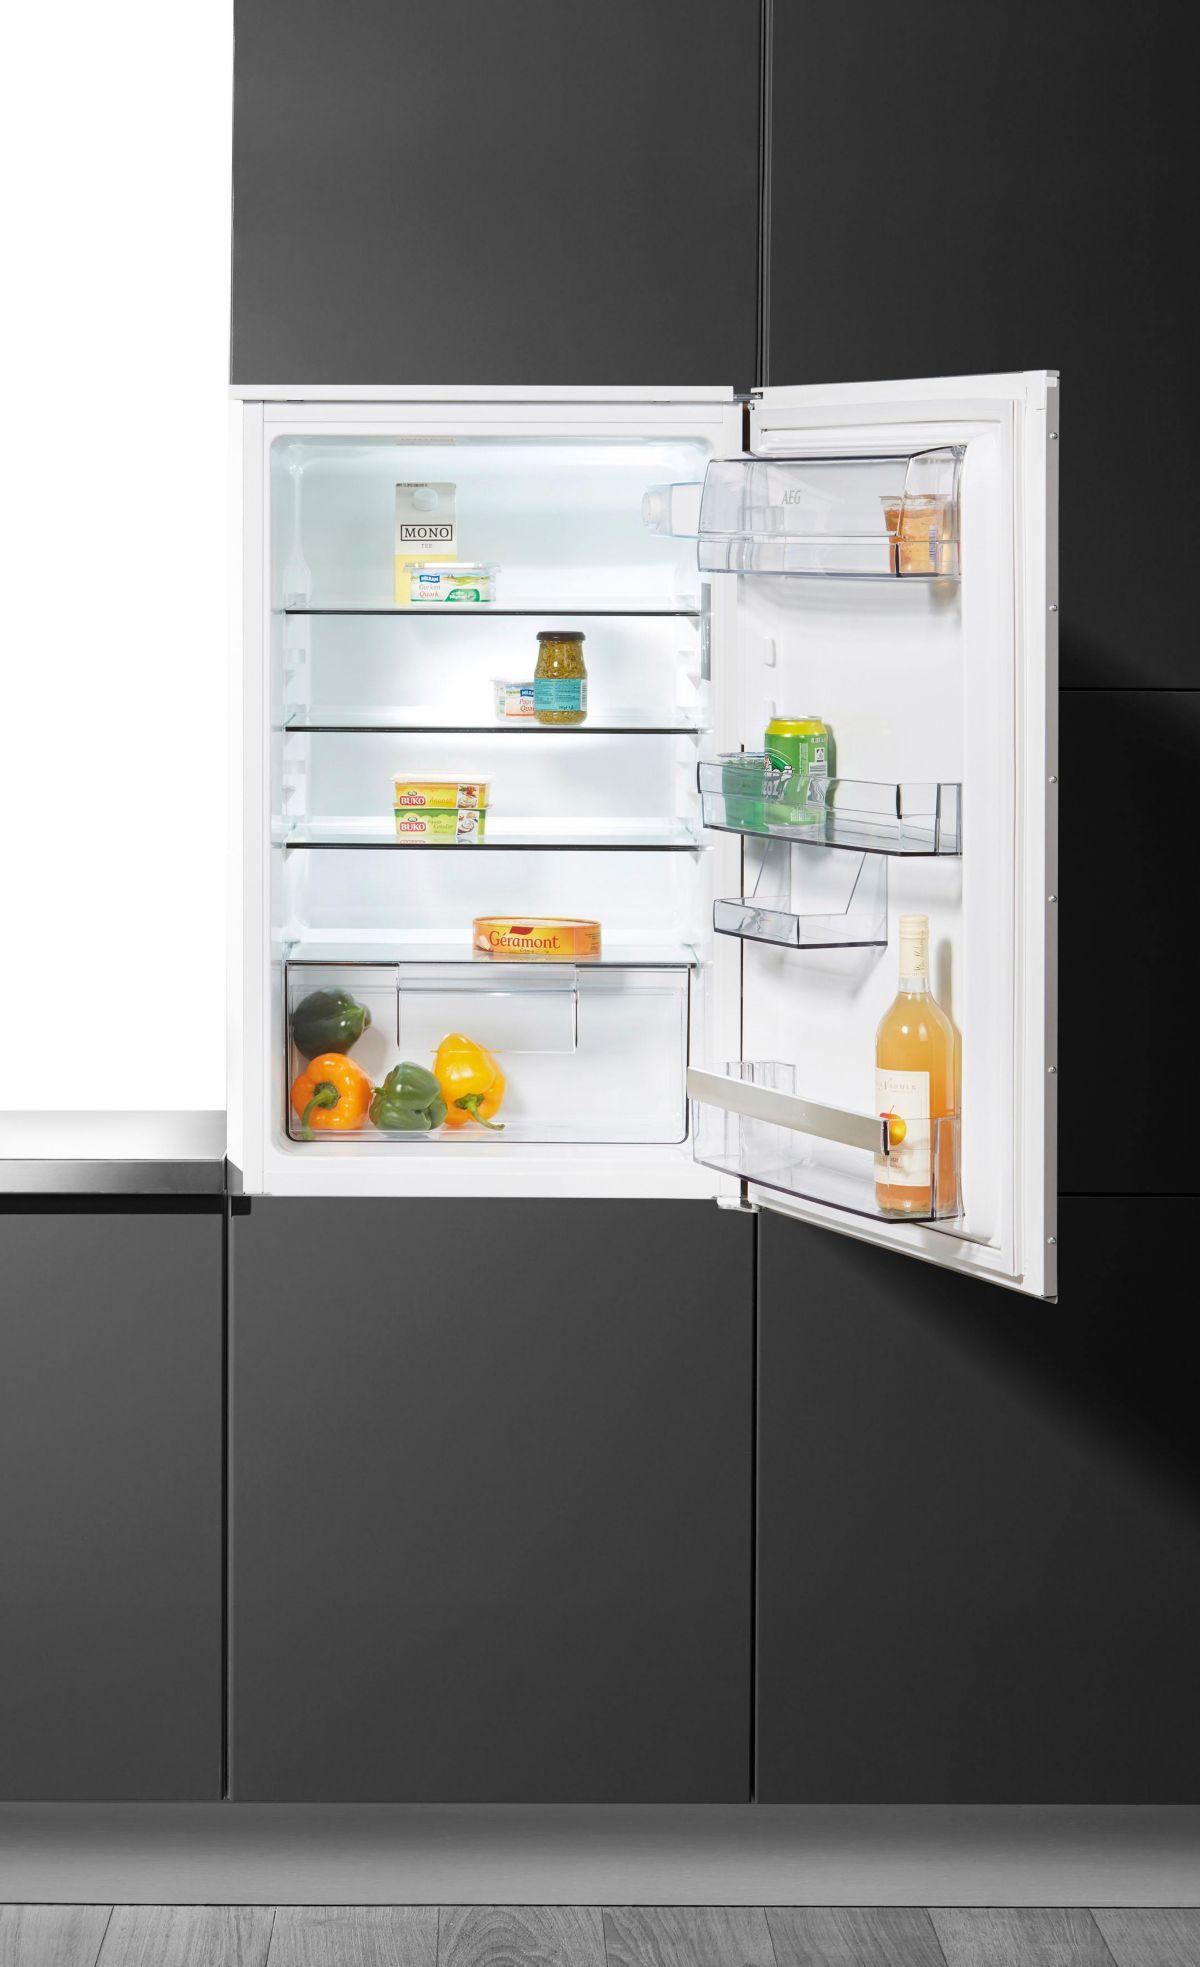 AEG Einbau-Kühlschrank SANTO SKB58821AE, Energi...